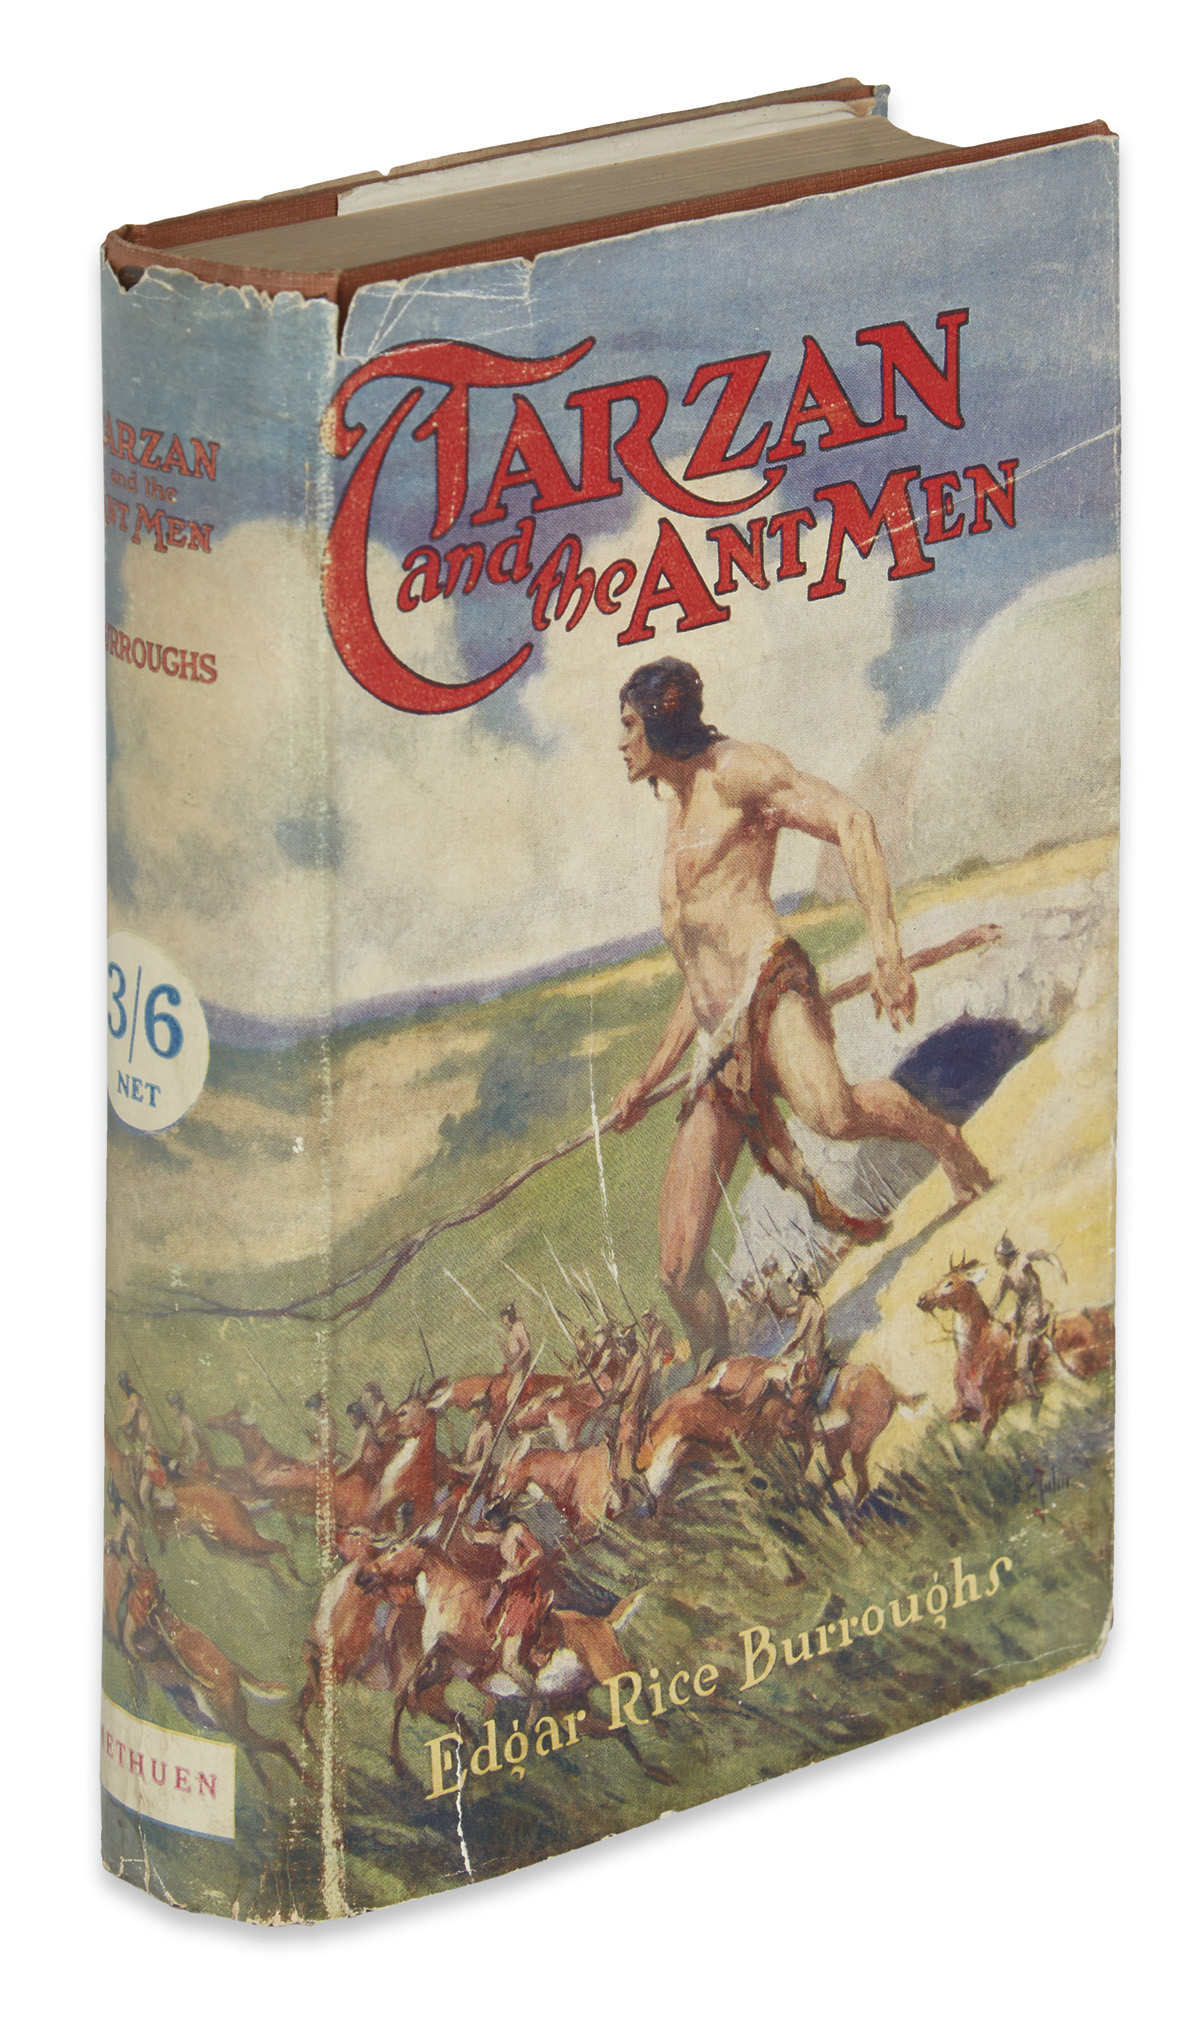 BURROUGHS-EDGAR-RICE-Tarzan-and-the-Ant-Men